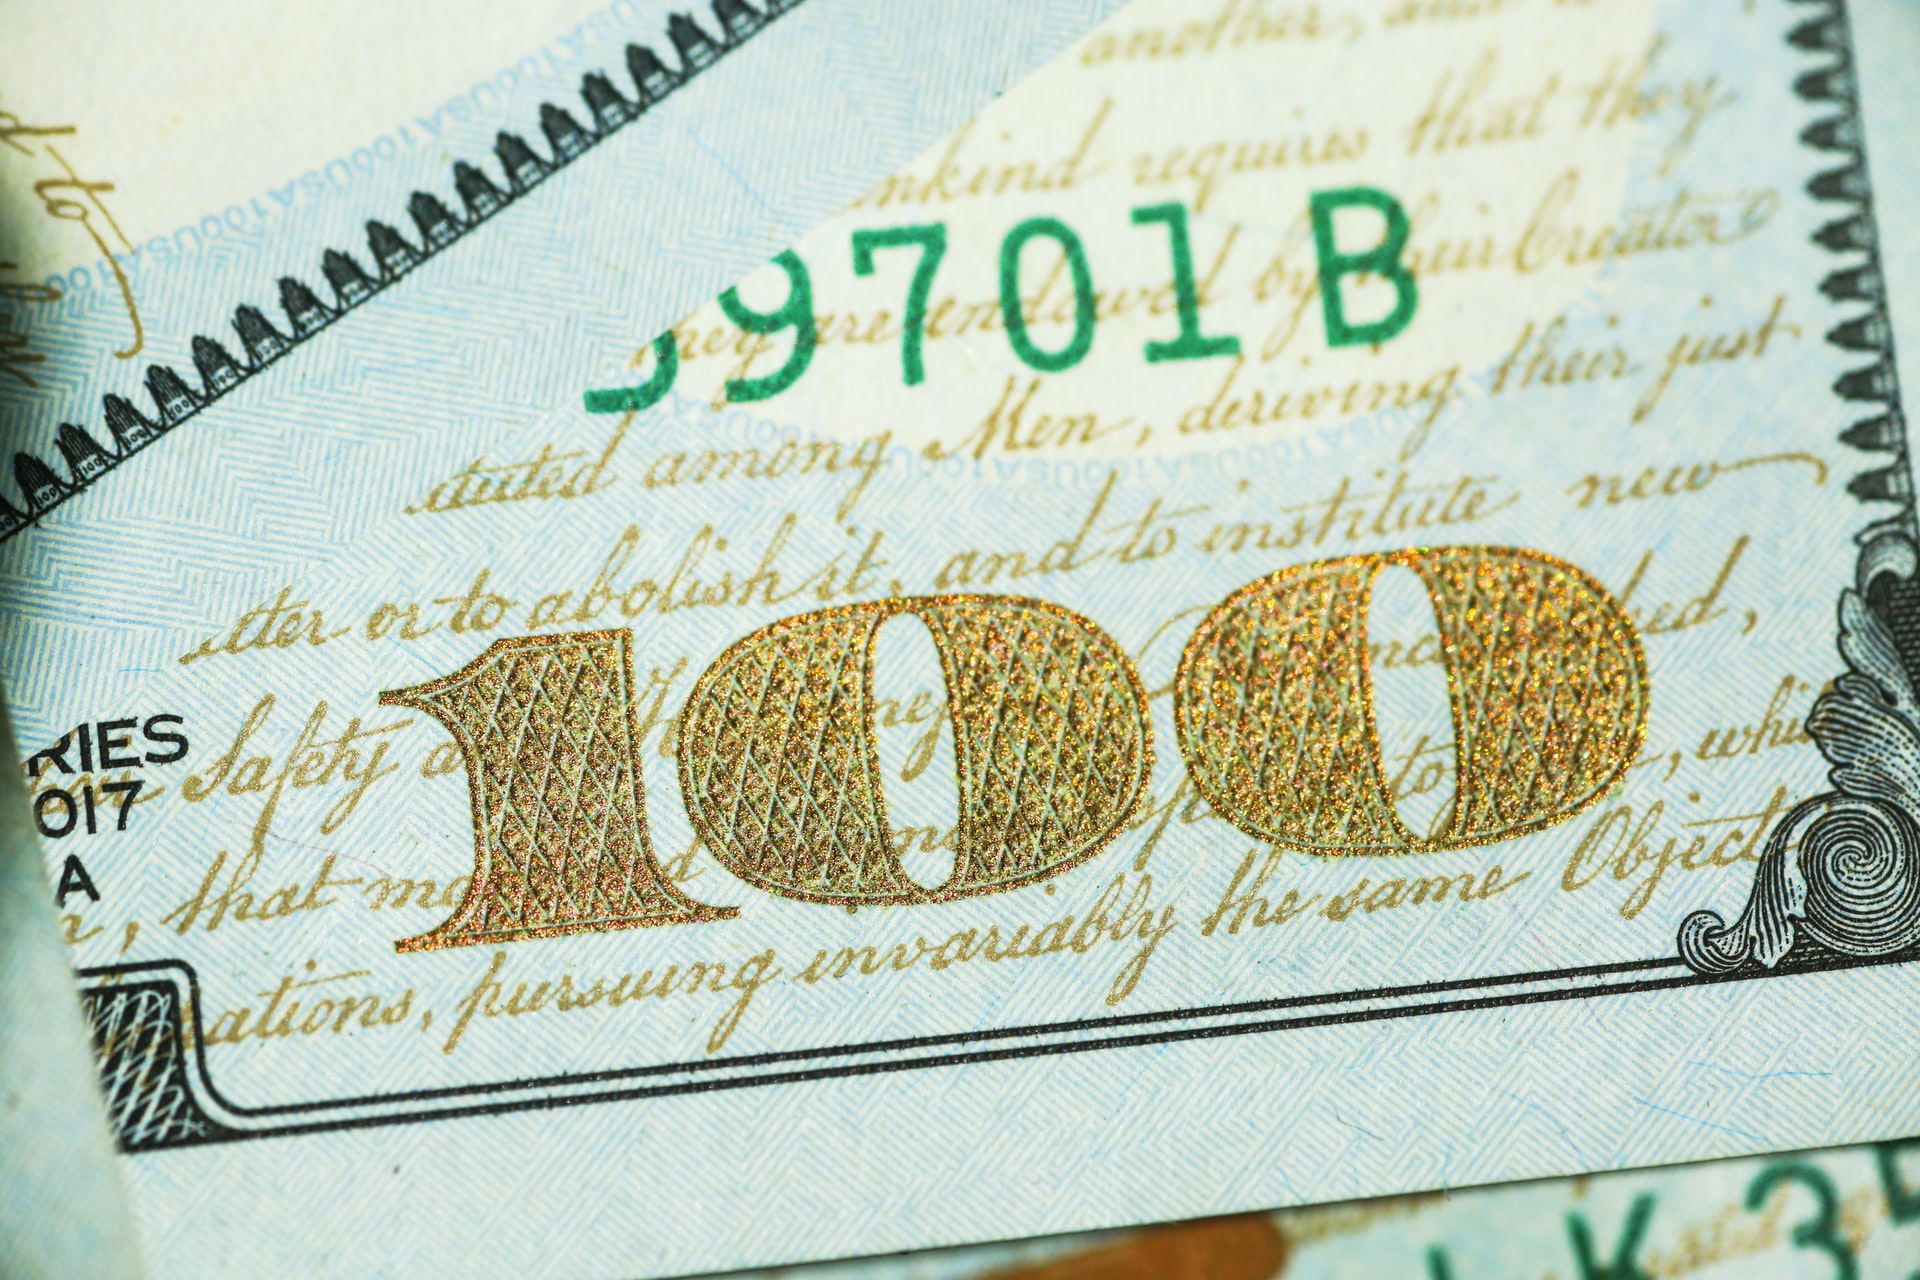 treasury management ; close-up of money